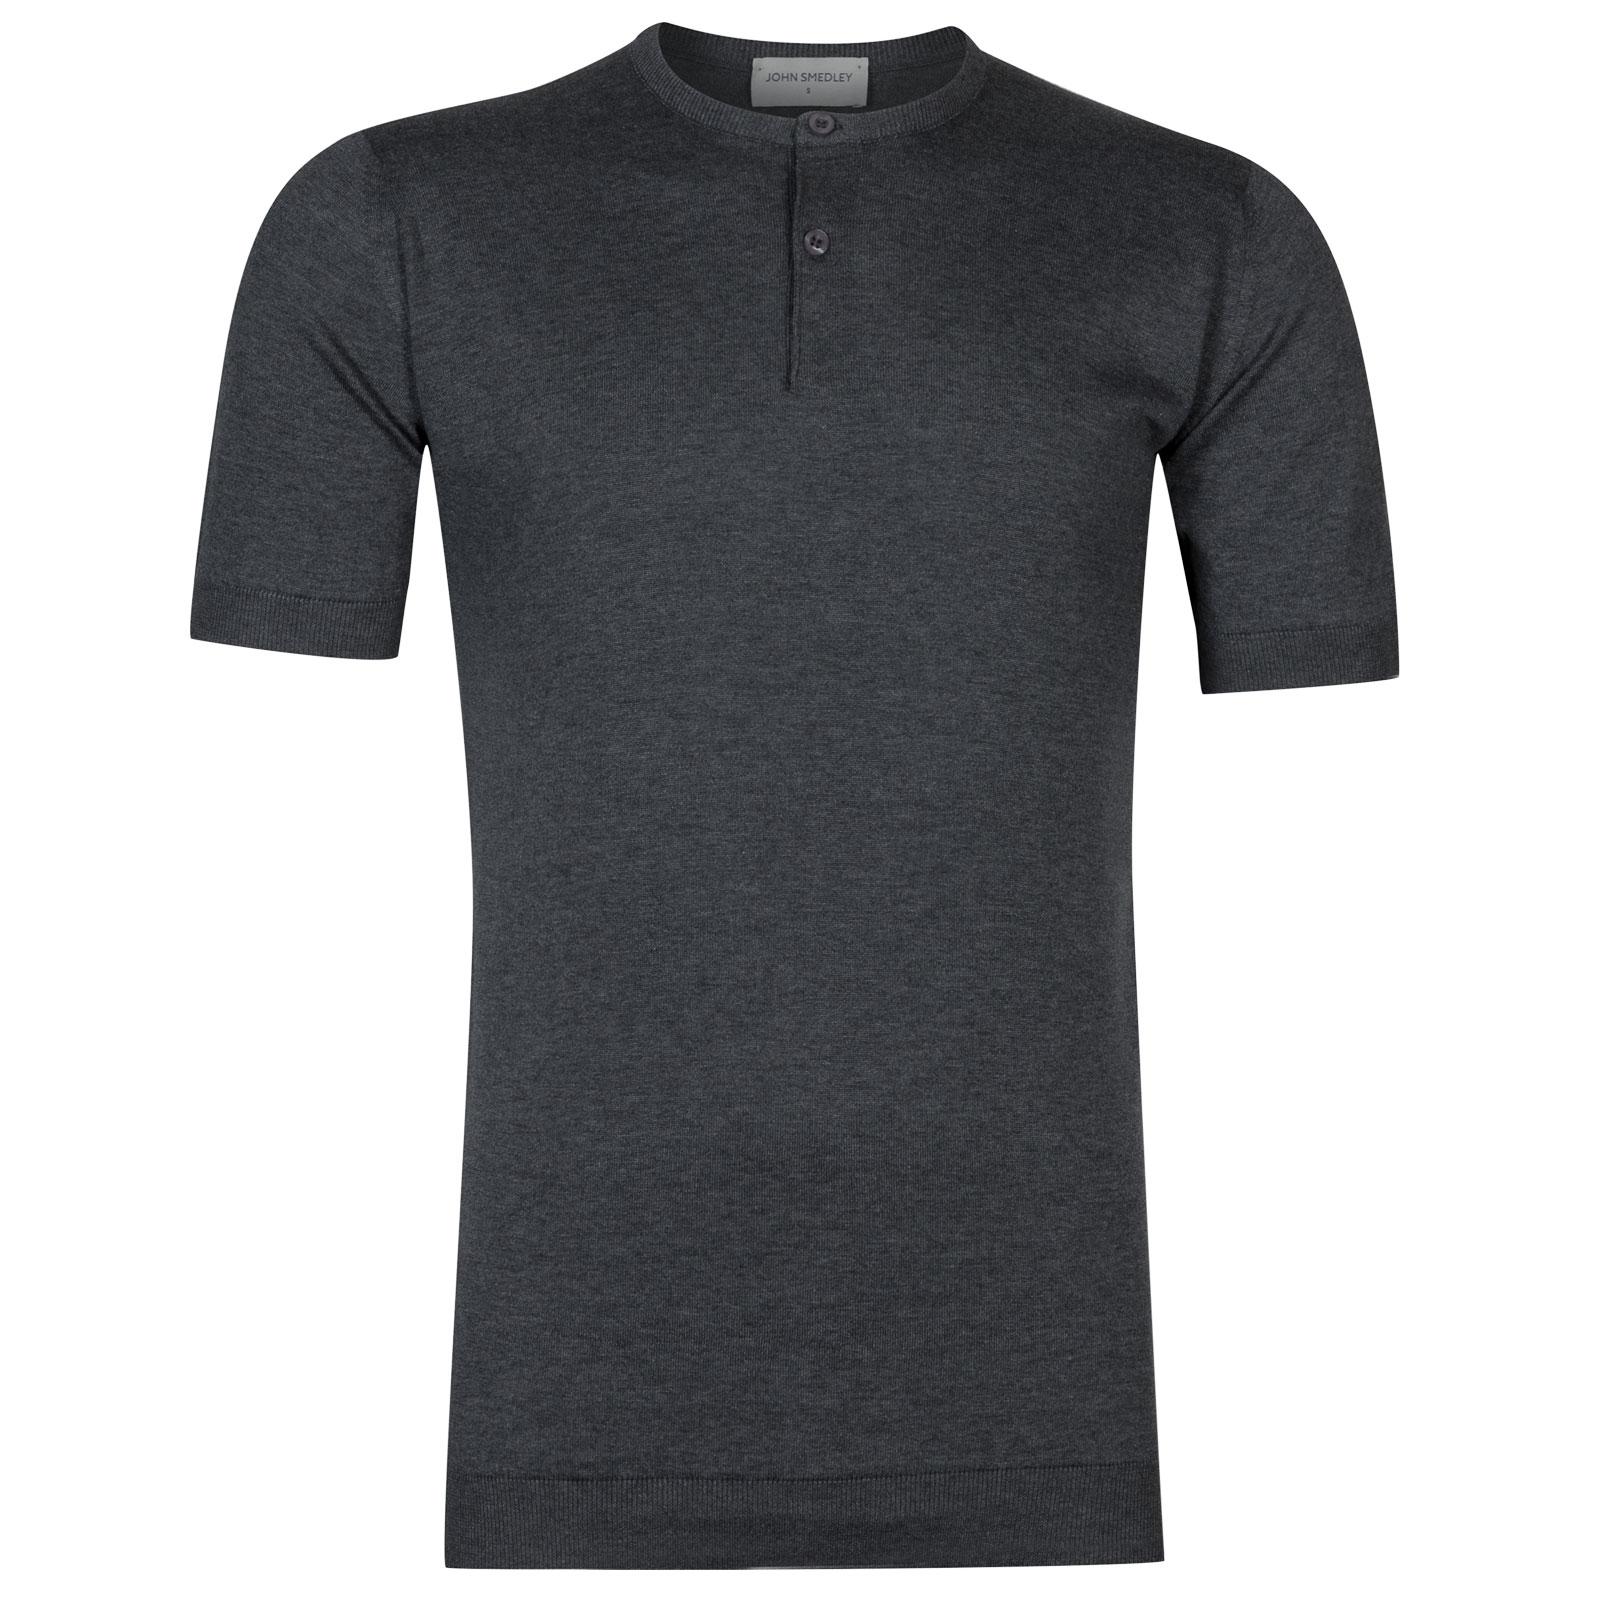 John Smedley Bennett Sea Island Cotton T-shirt in Charcoal-L